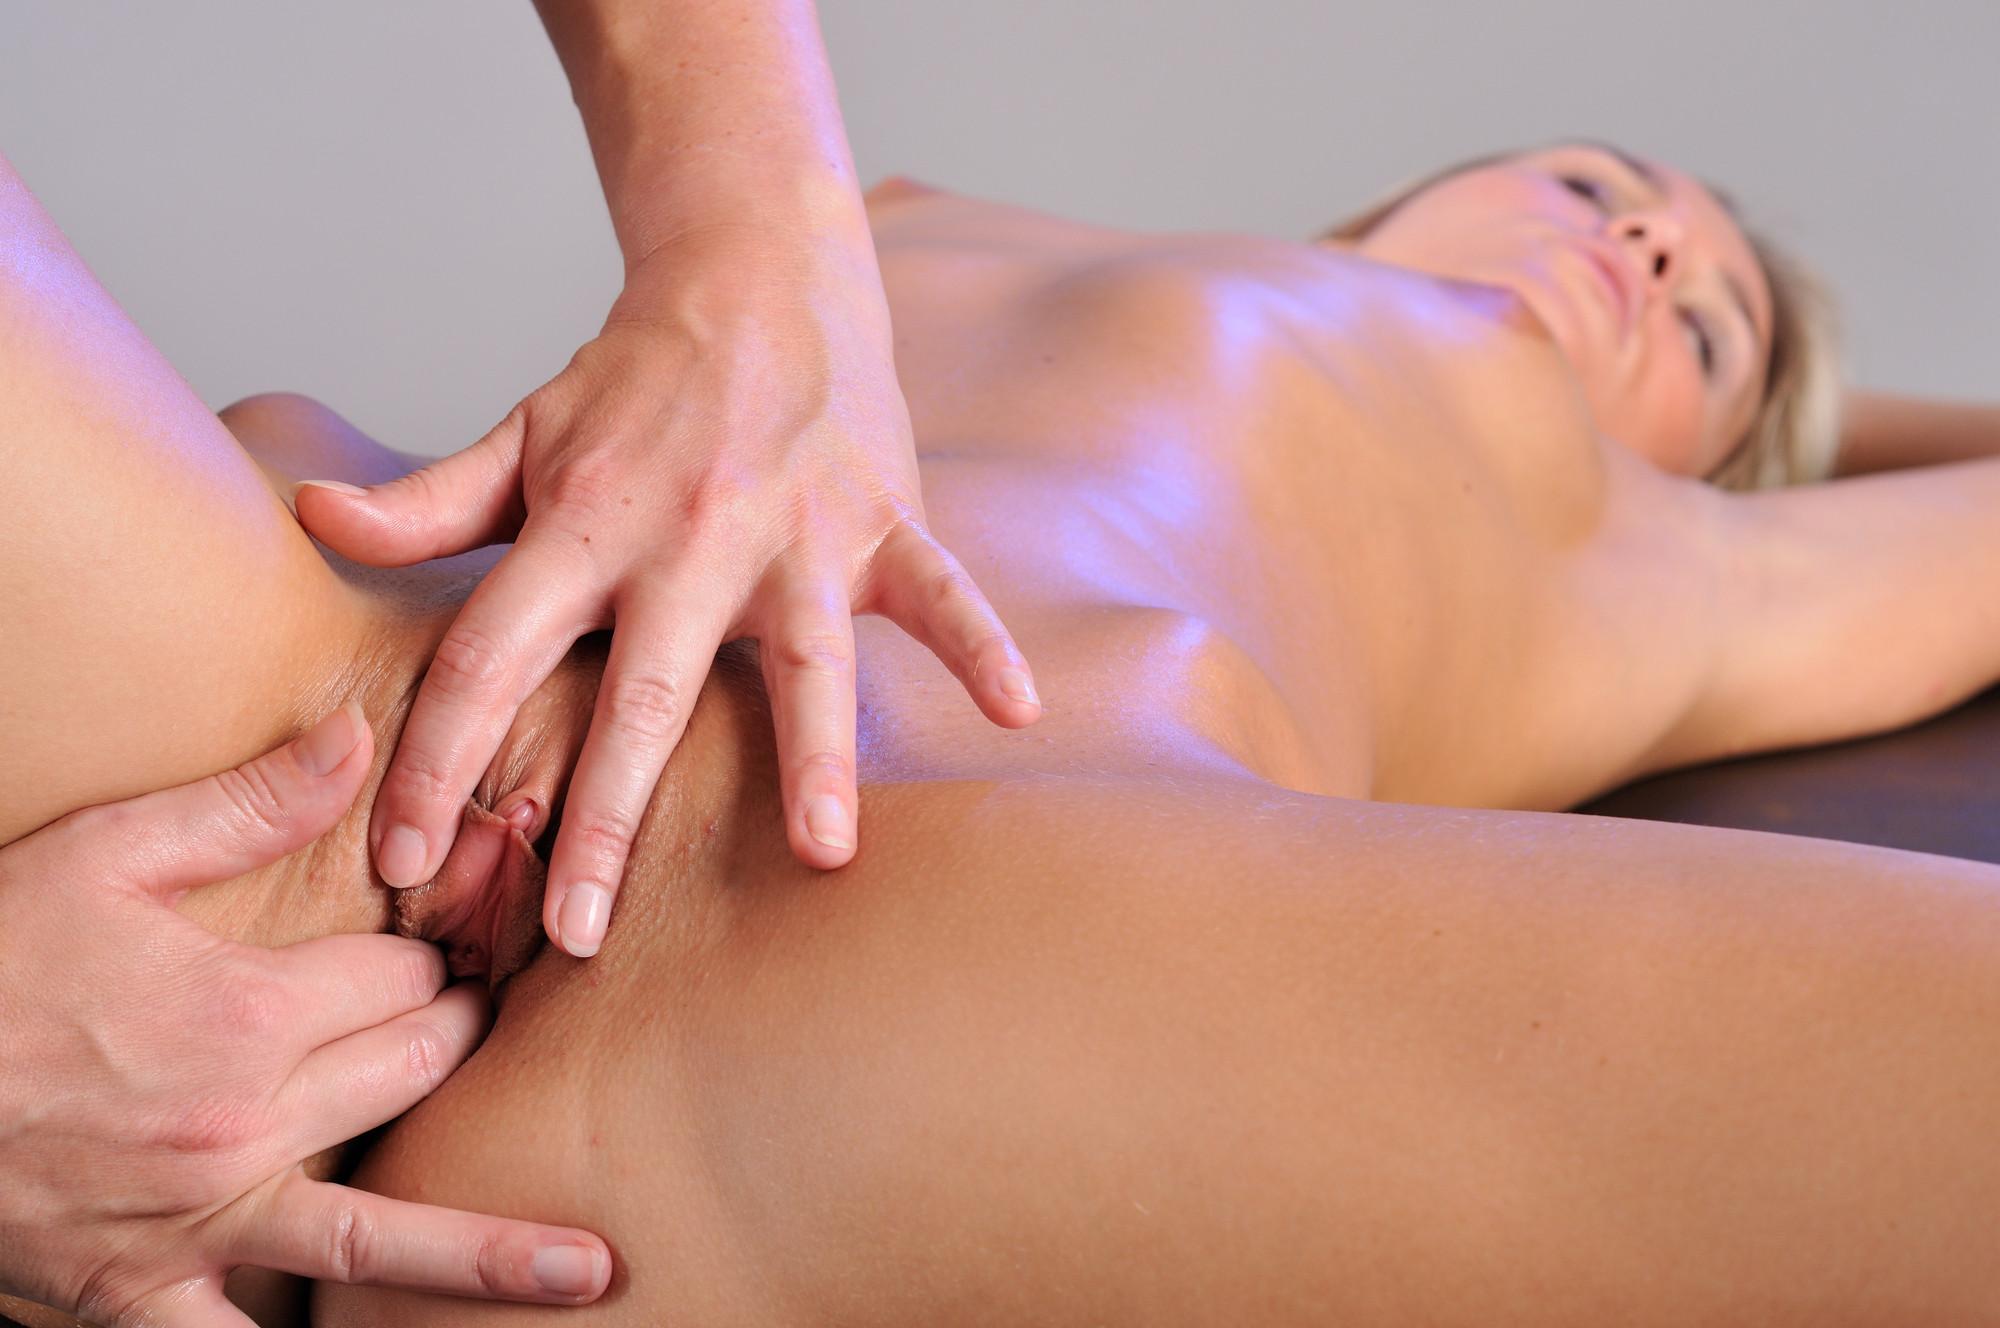 Massages the vagina